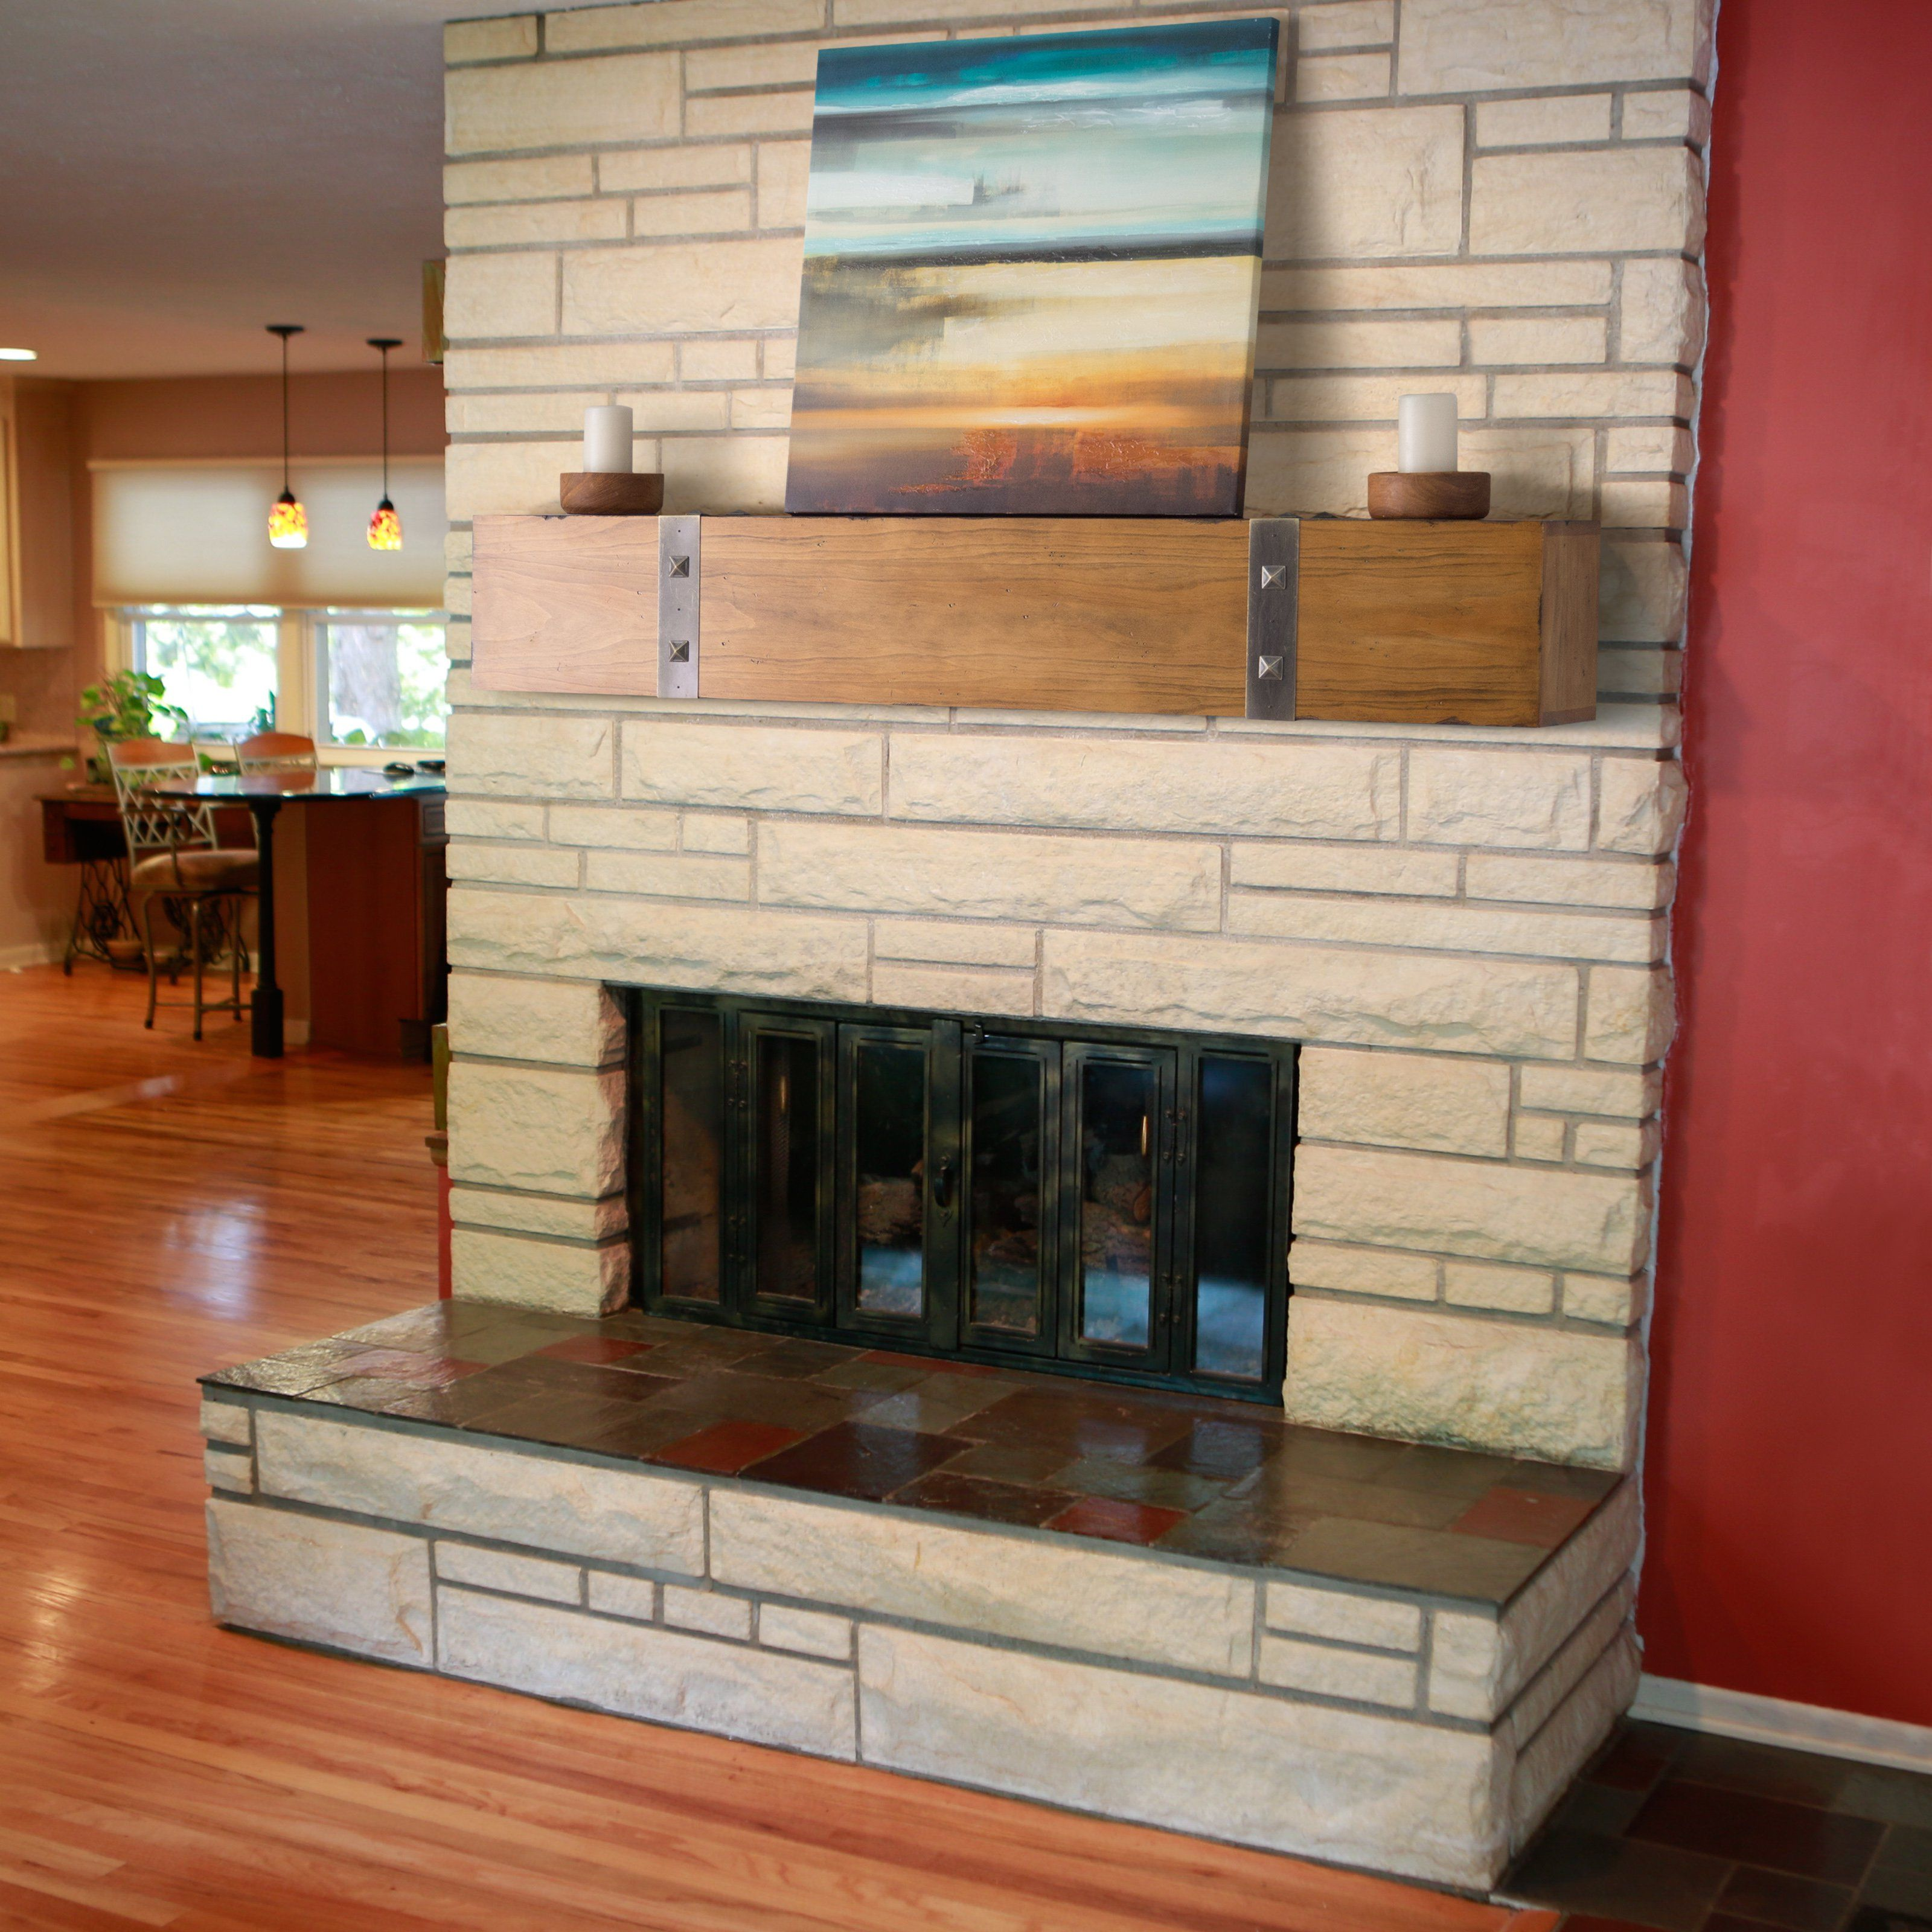 Belham living rustic timber beam fireplace mantel from hayneedle